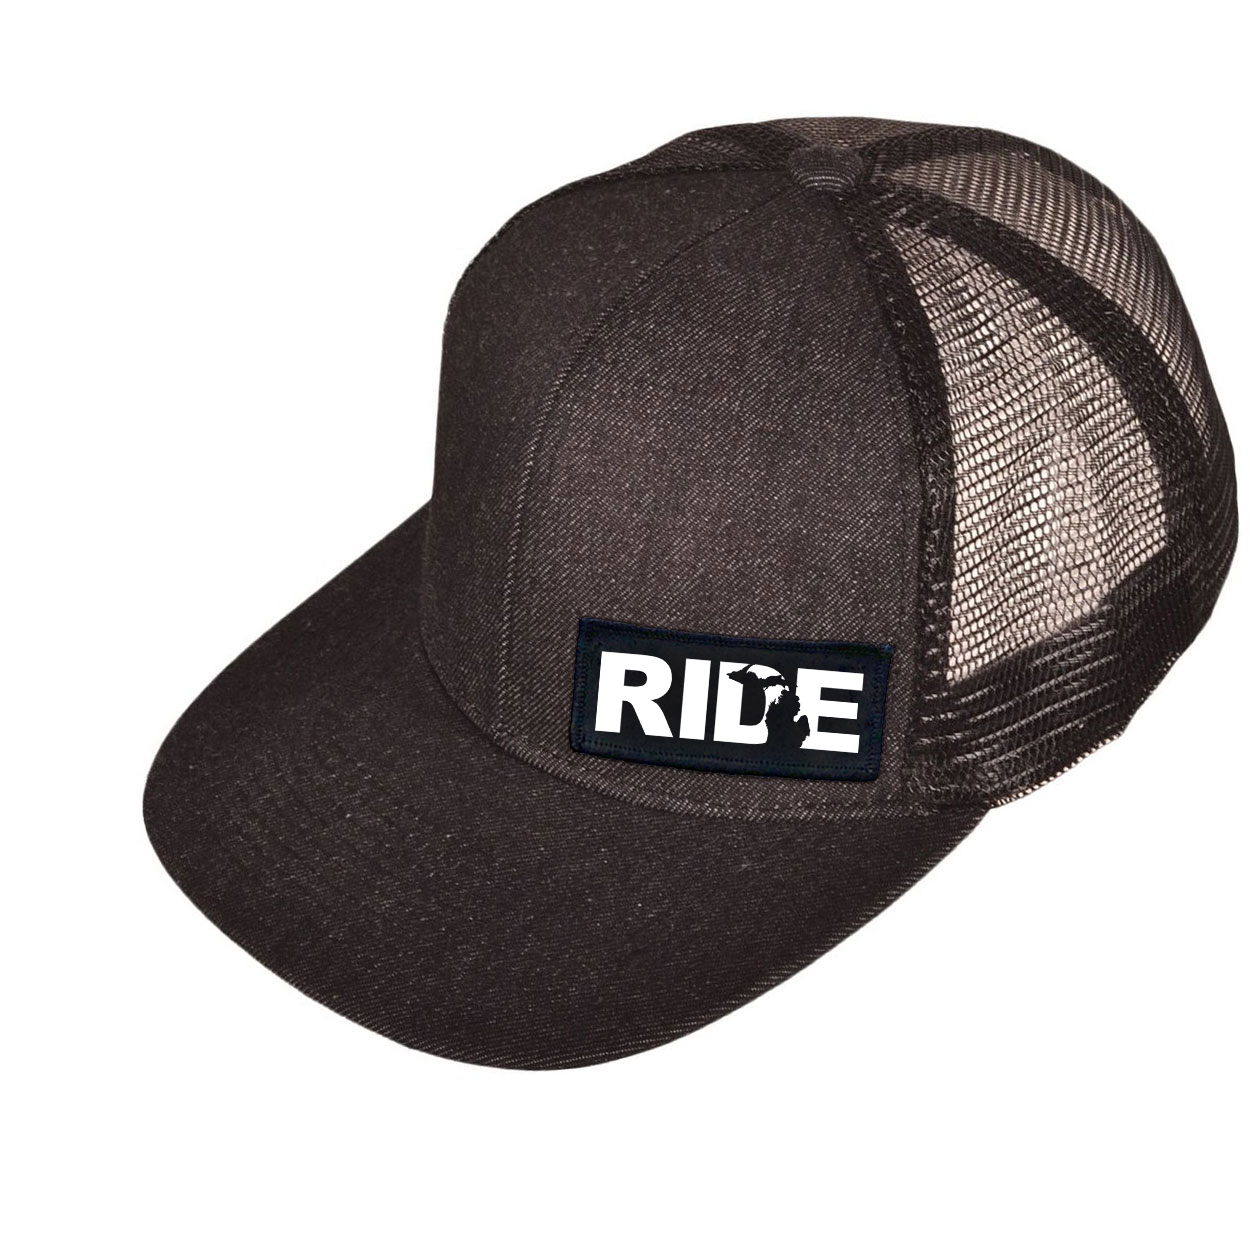 Ride Michigan Night Out Woven Patch Snapback Flat Brim Hat Black Denim (White Logo)